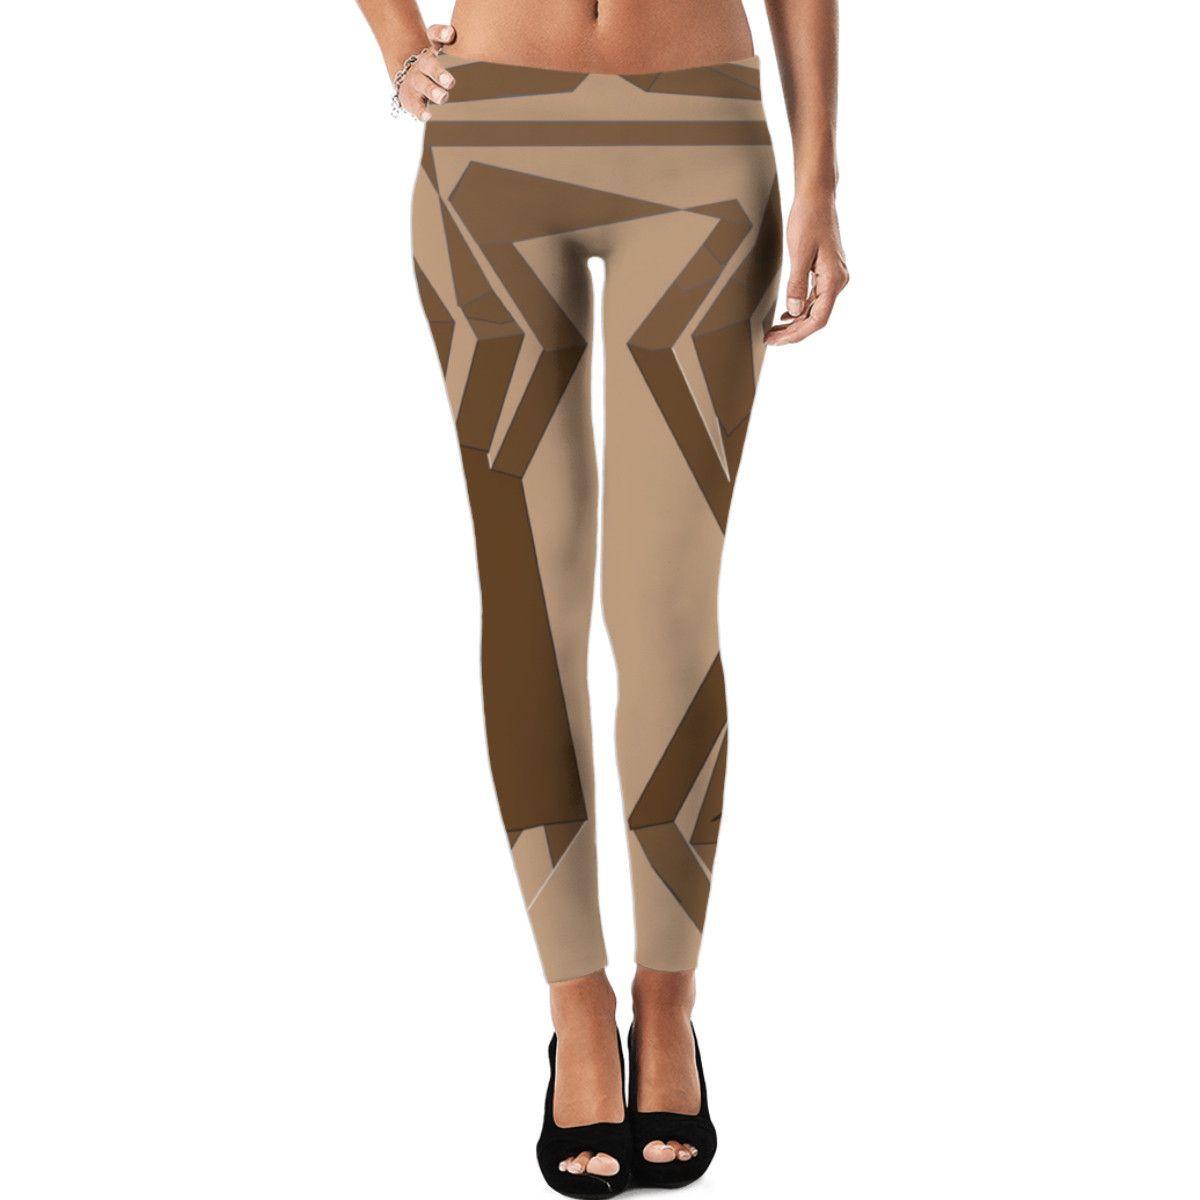 Sophisticated Chocolate Leggings |Ocdesignzz